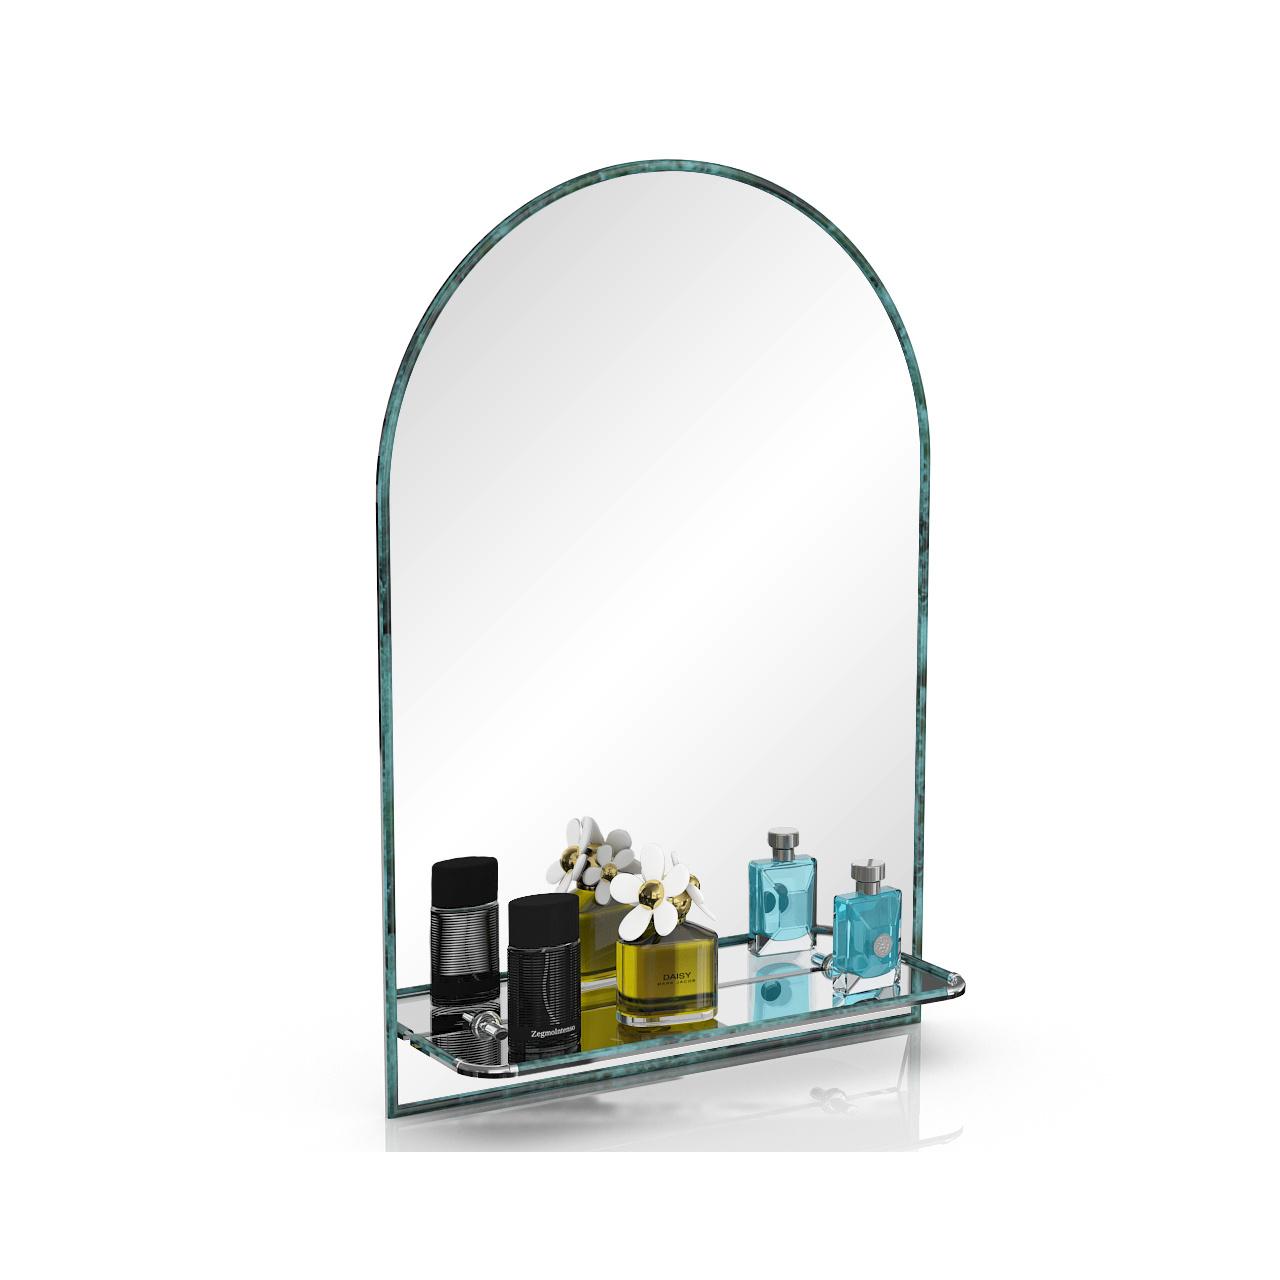 Зеркало ЕвроЗеркало 330ПМ малахит, 55х80 см.,